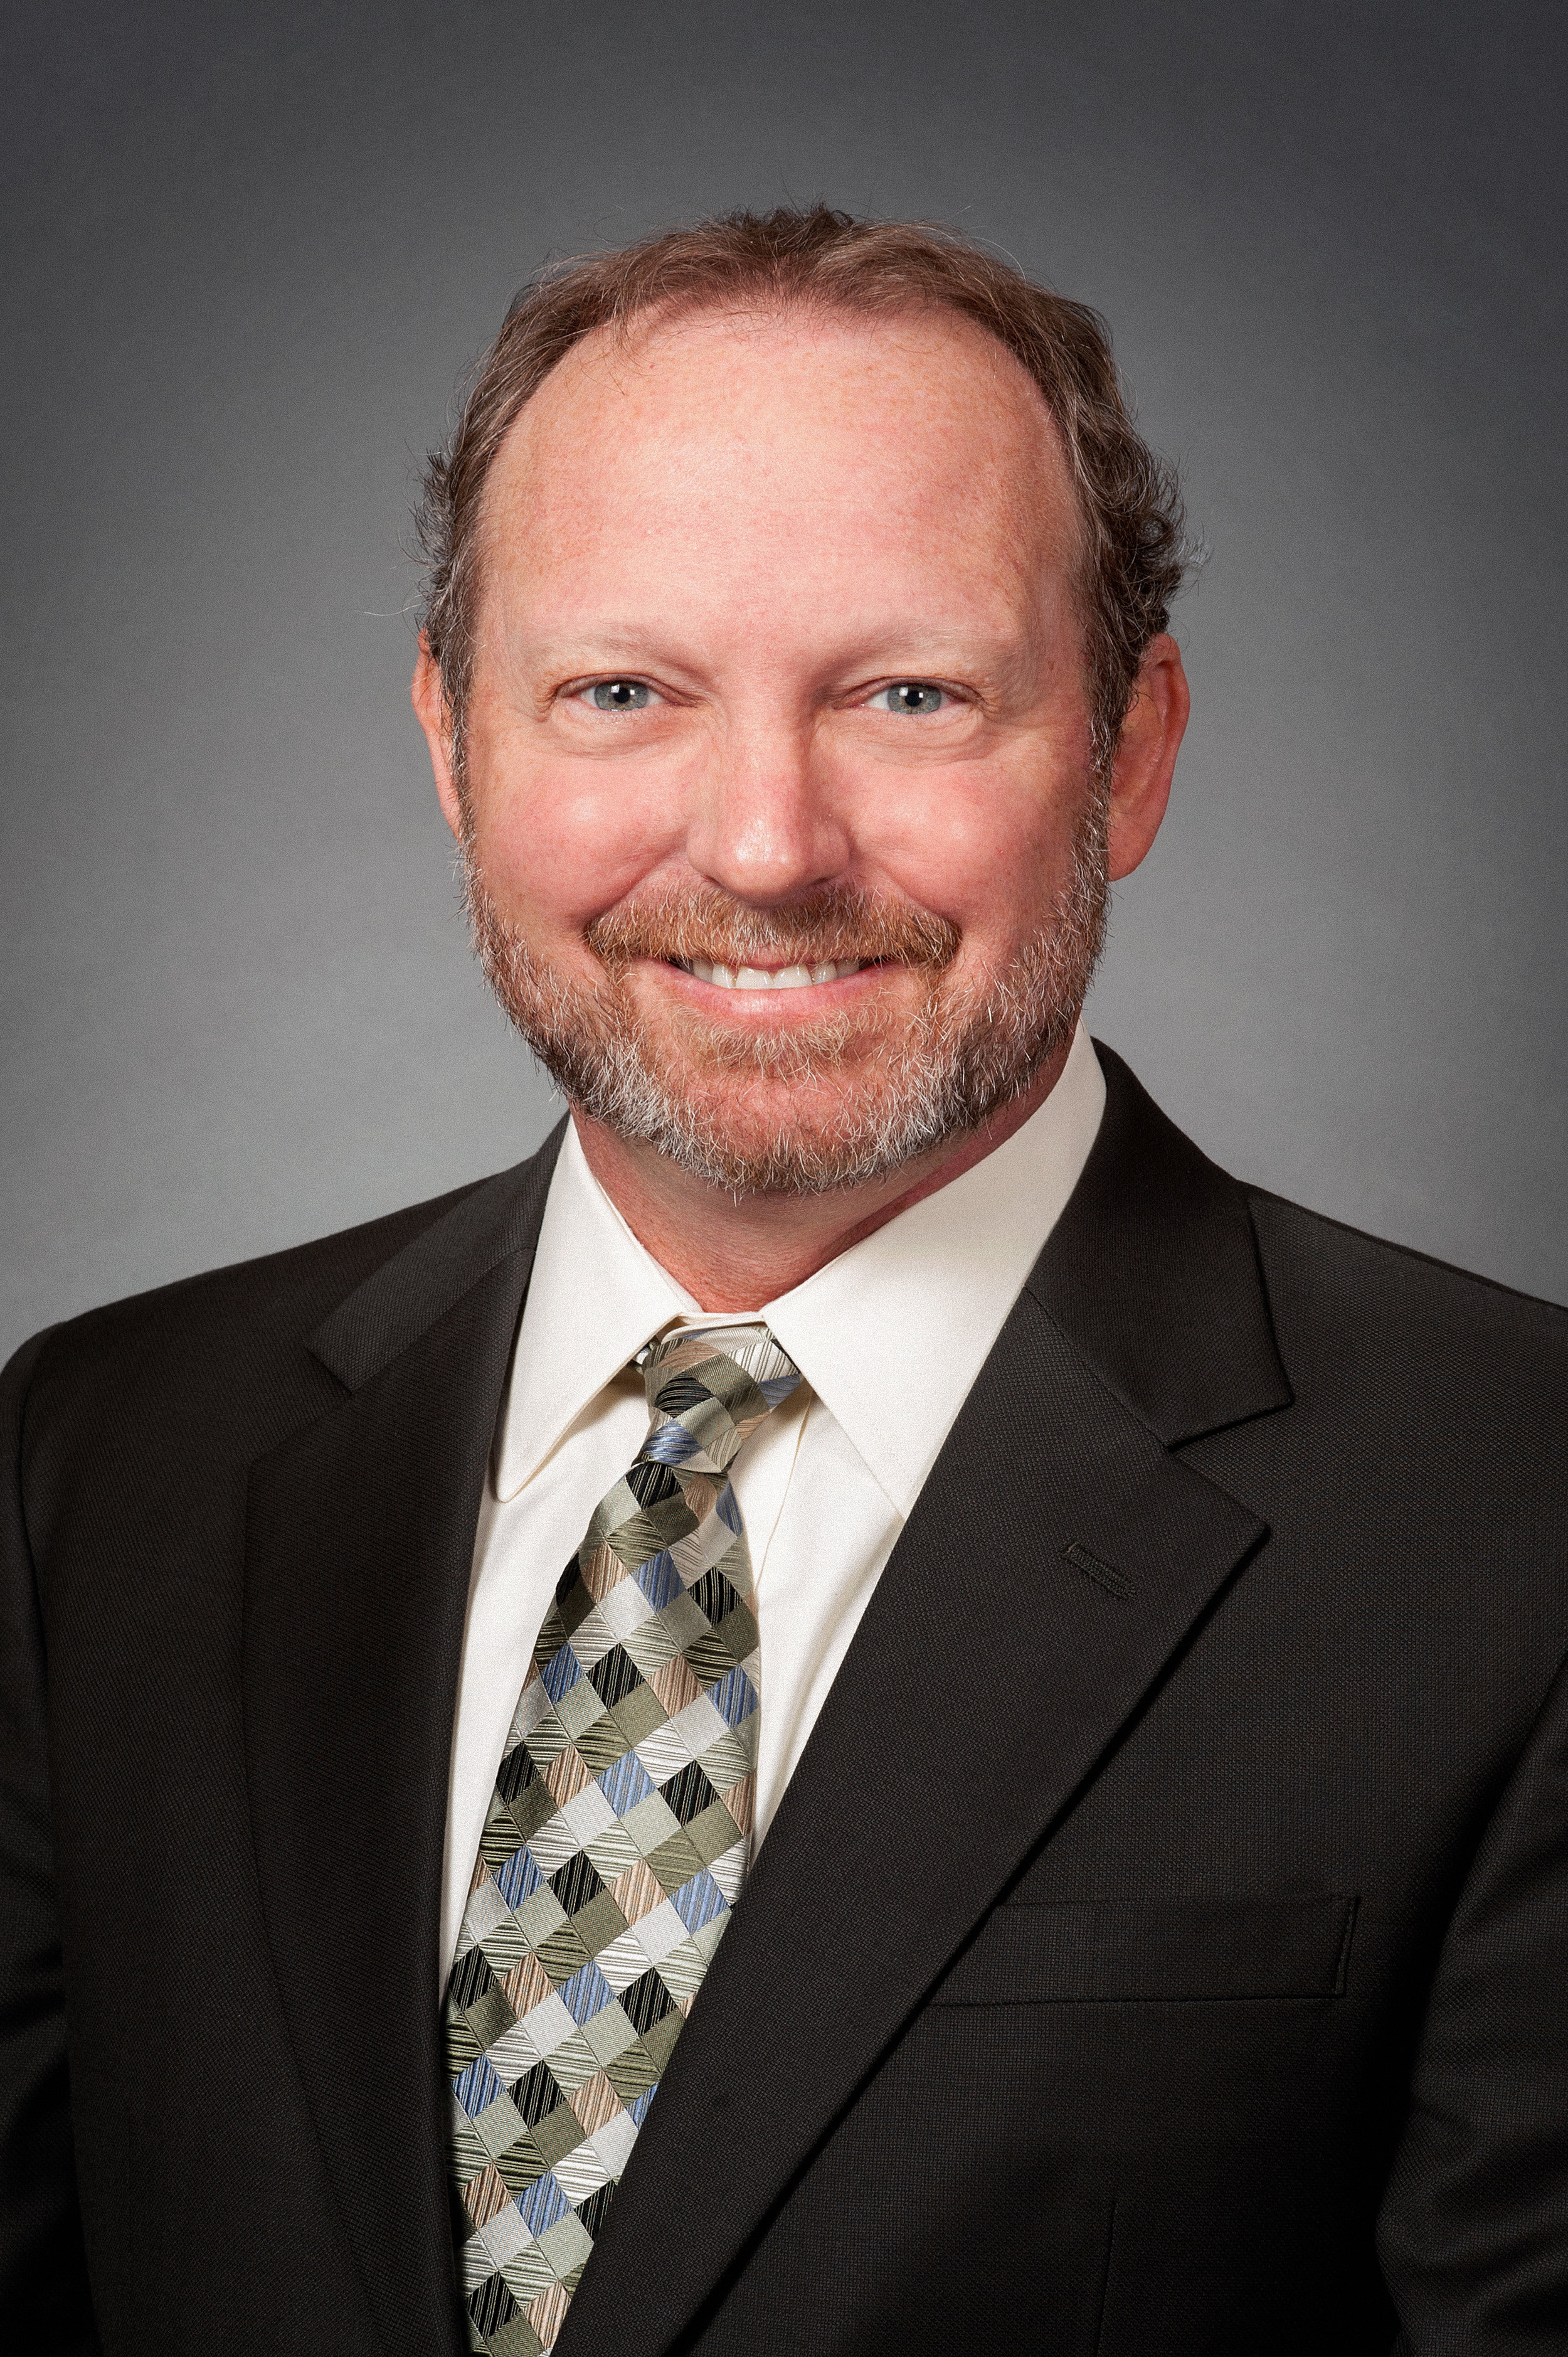 Brian Nemeroff, CPA - Audit Partner